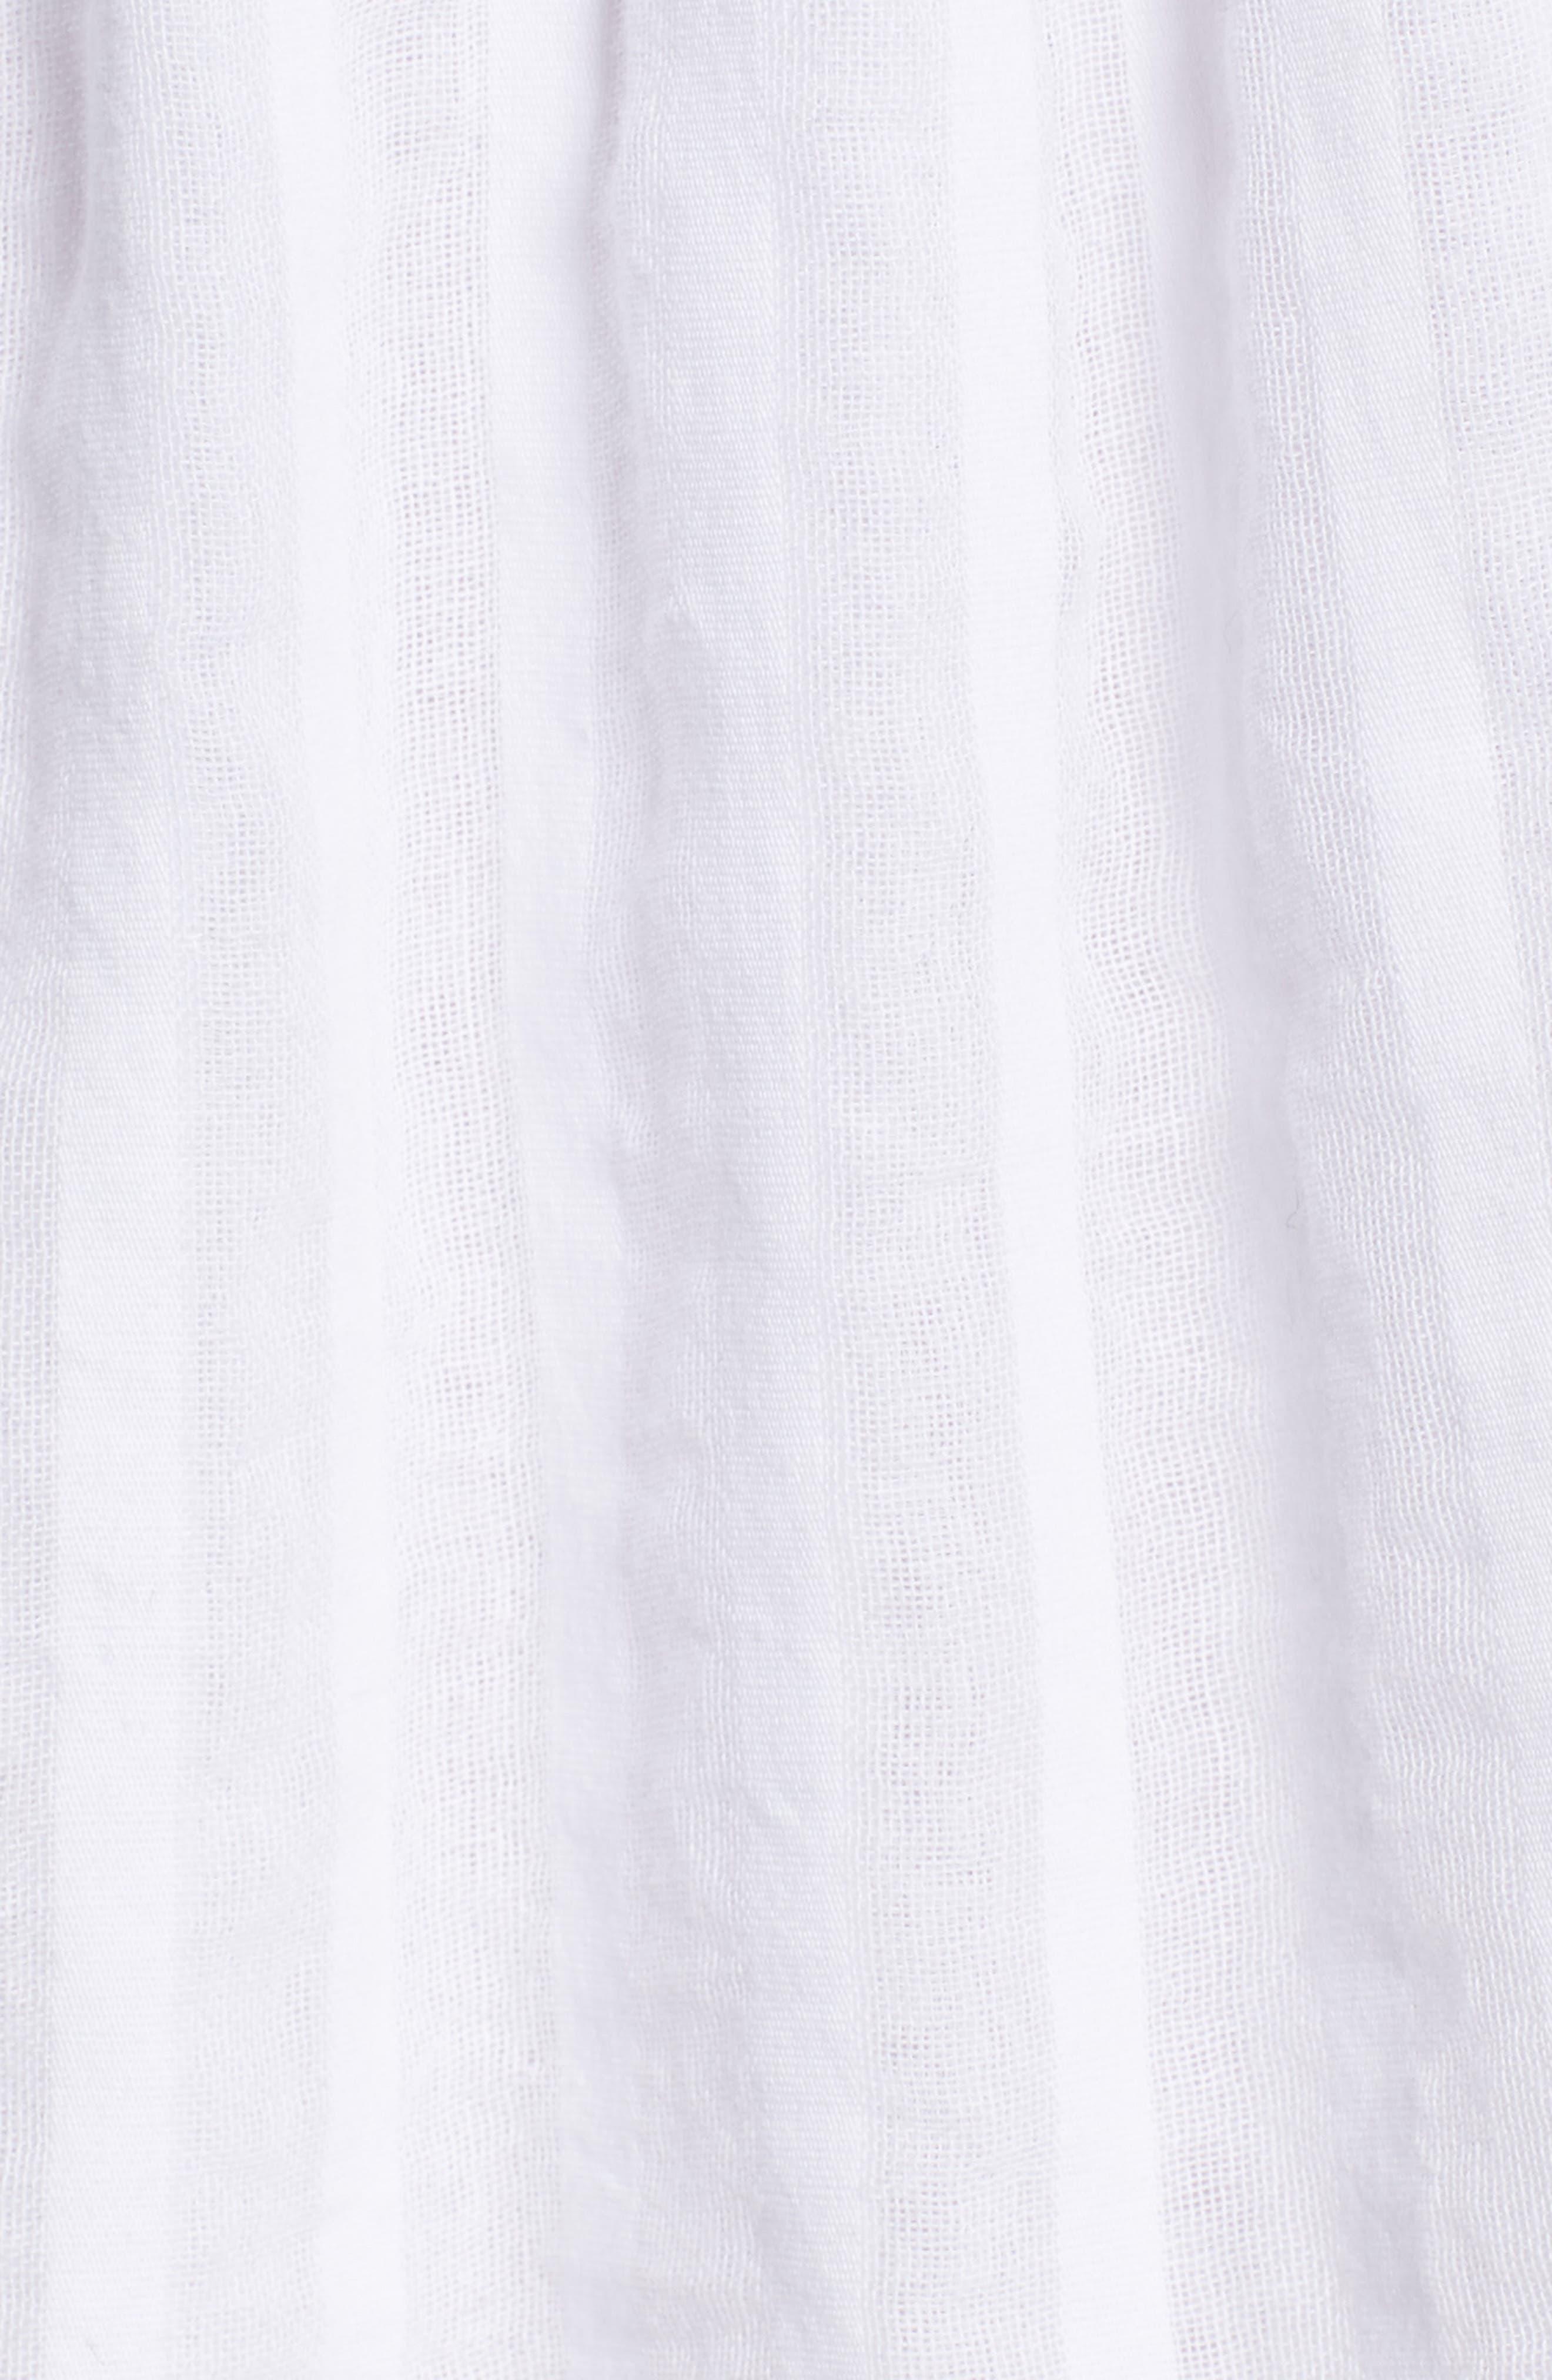 Lucca Blouson Cotton Dress,                             Alternate thumbnail 6, color,                             WHITE SHADOW STRIPE